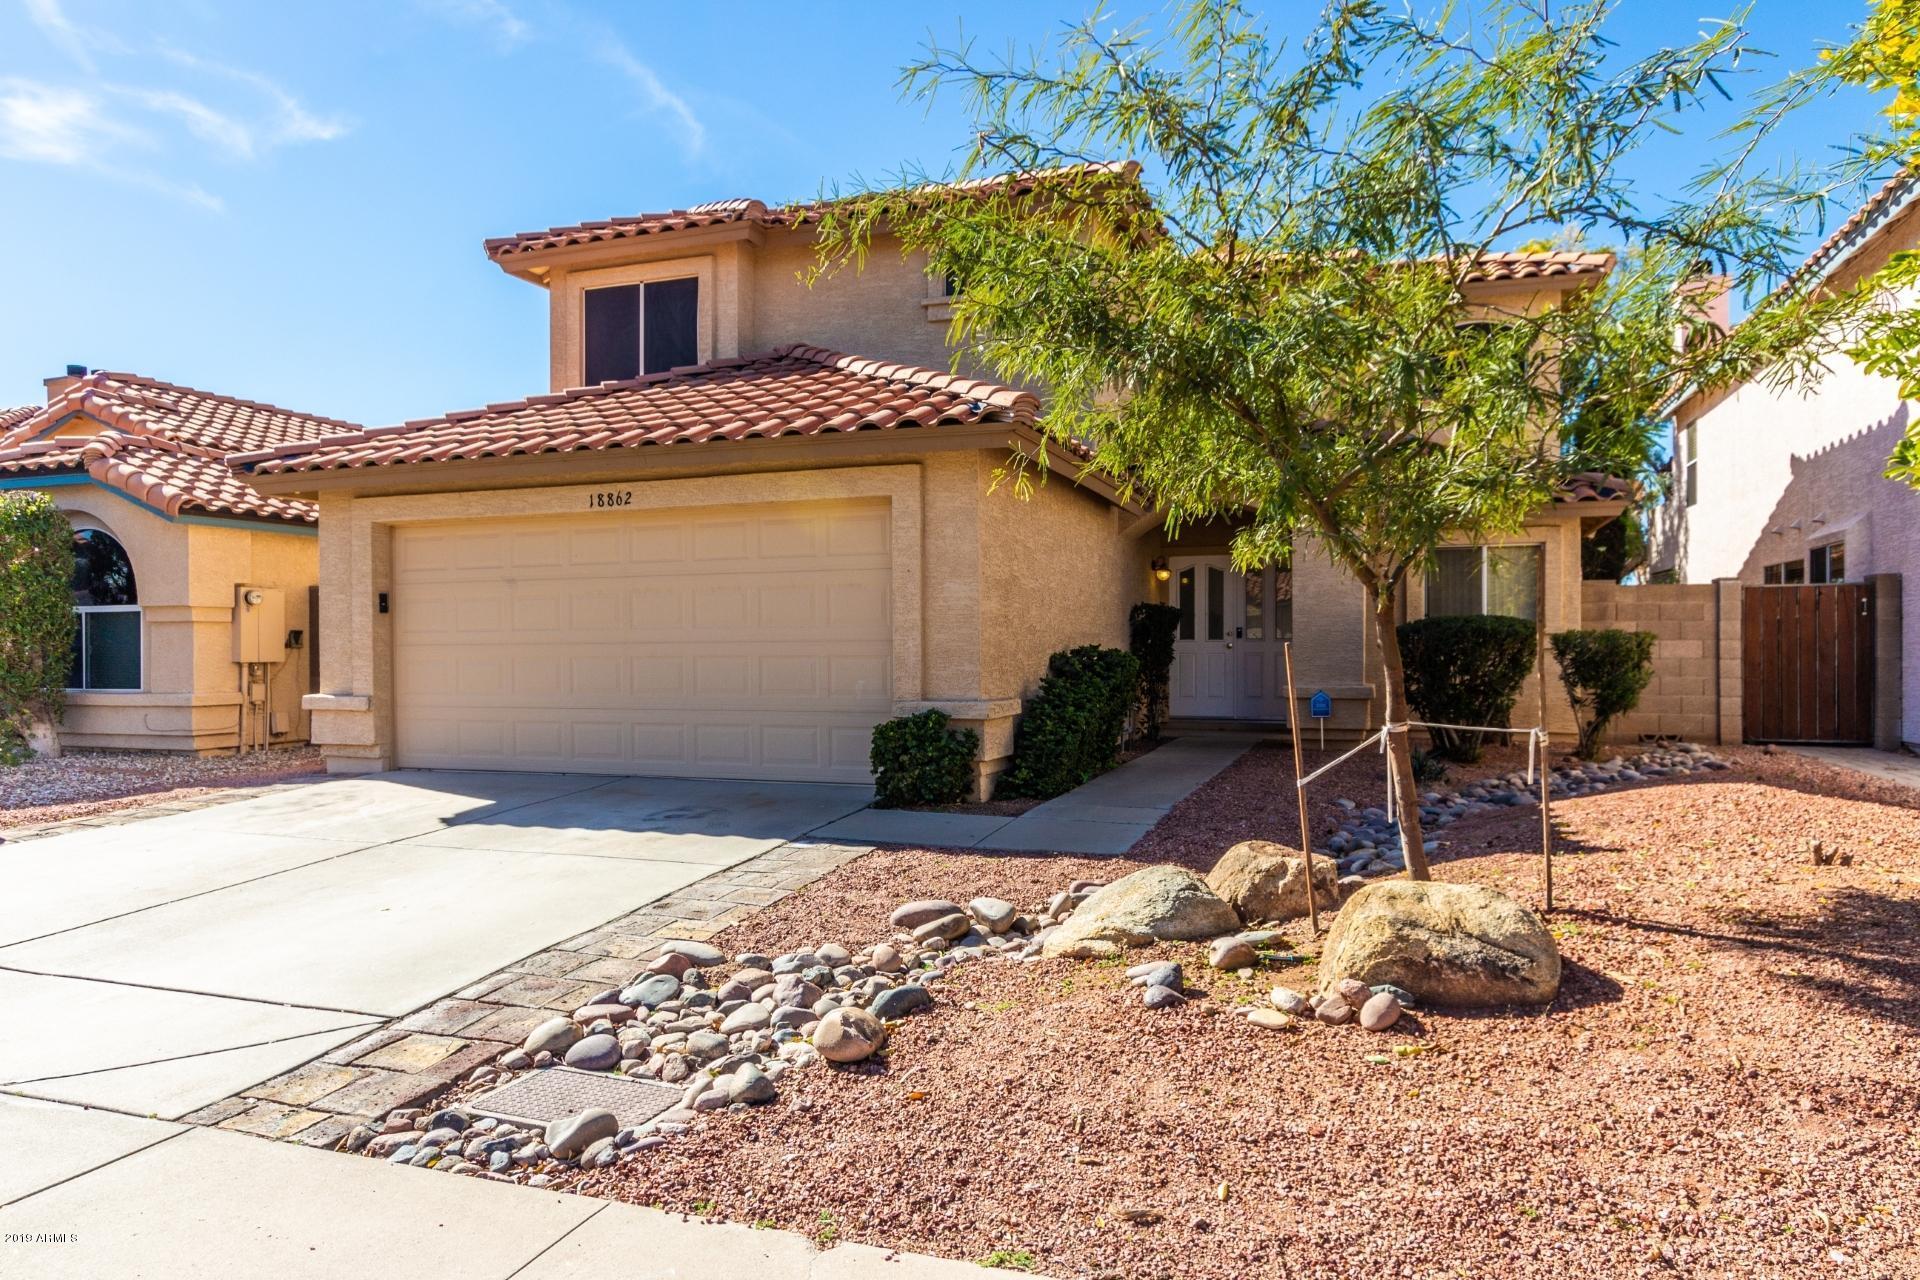 Photo of 18862 N 77TH Avenue, Glendale, AZ 85308